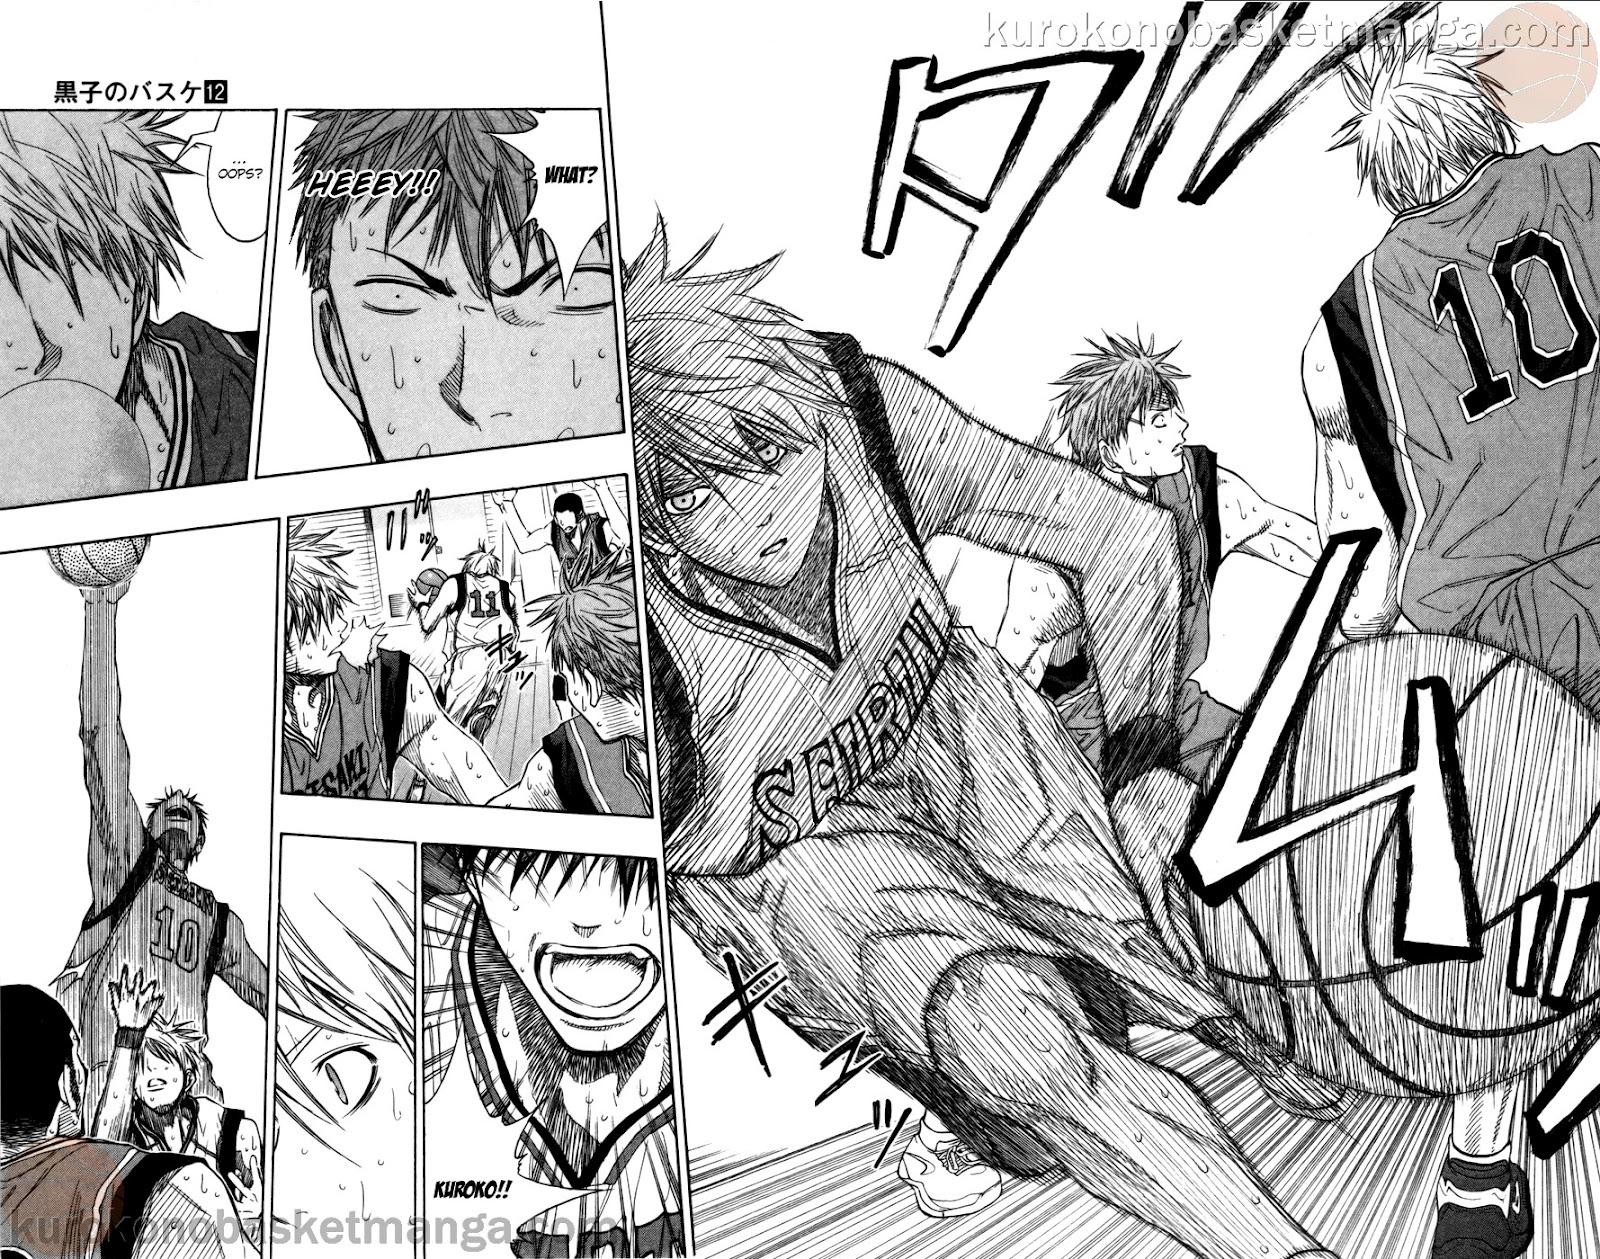 Kuroko no Basket Manga Chapter 103 - Image 16-17